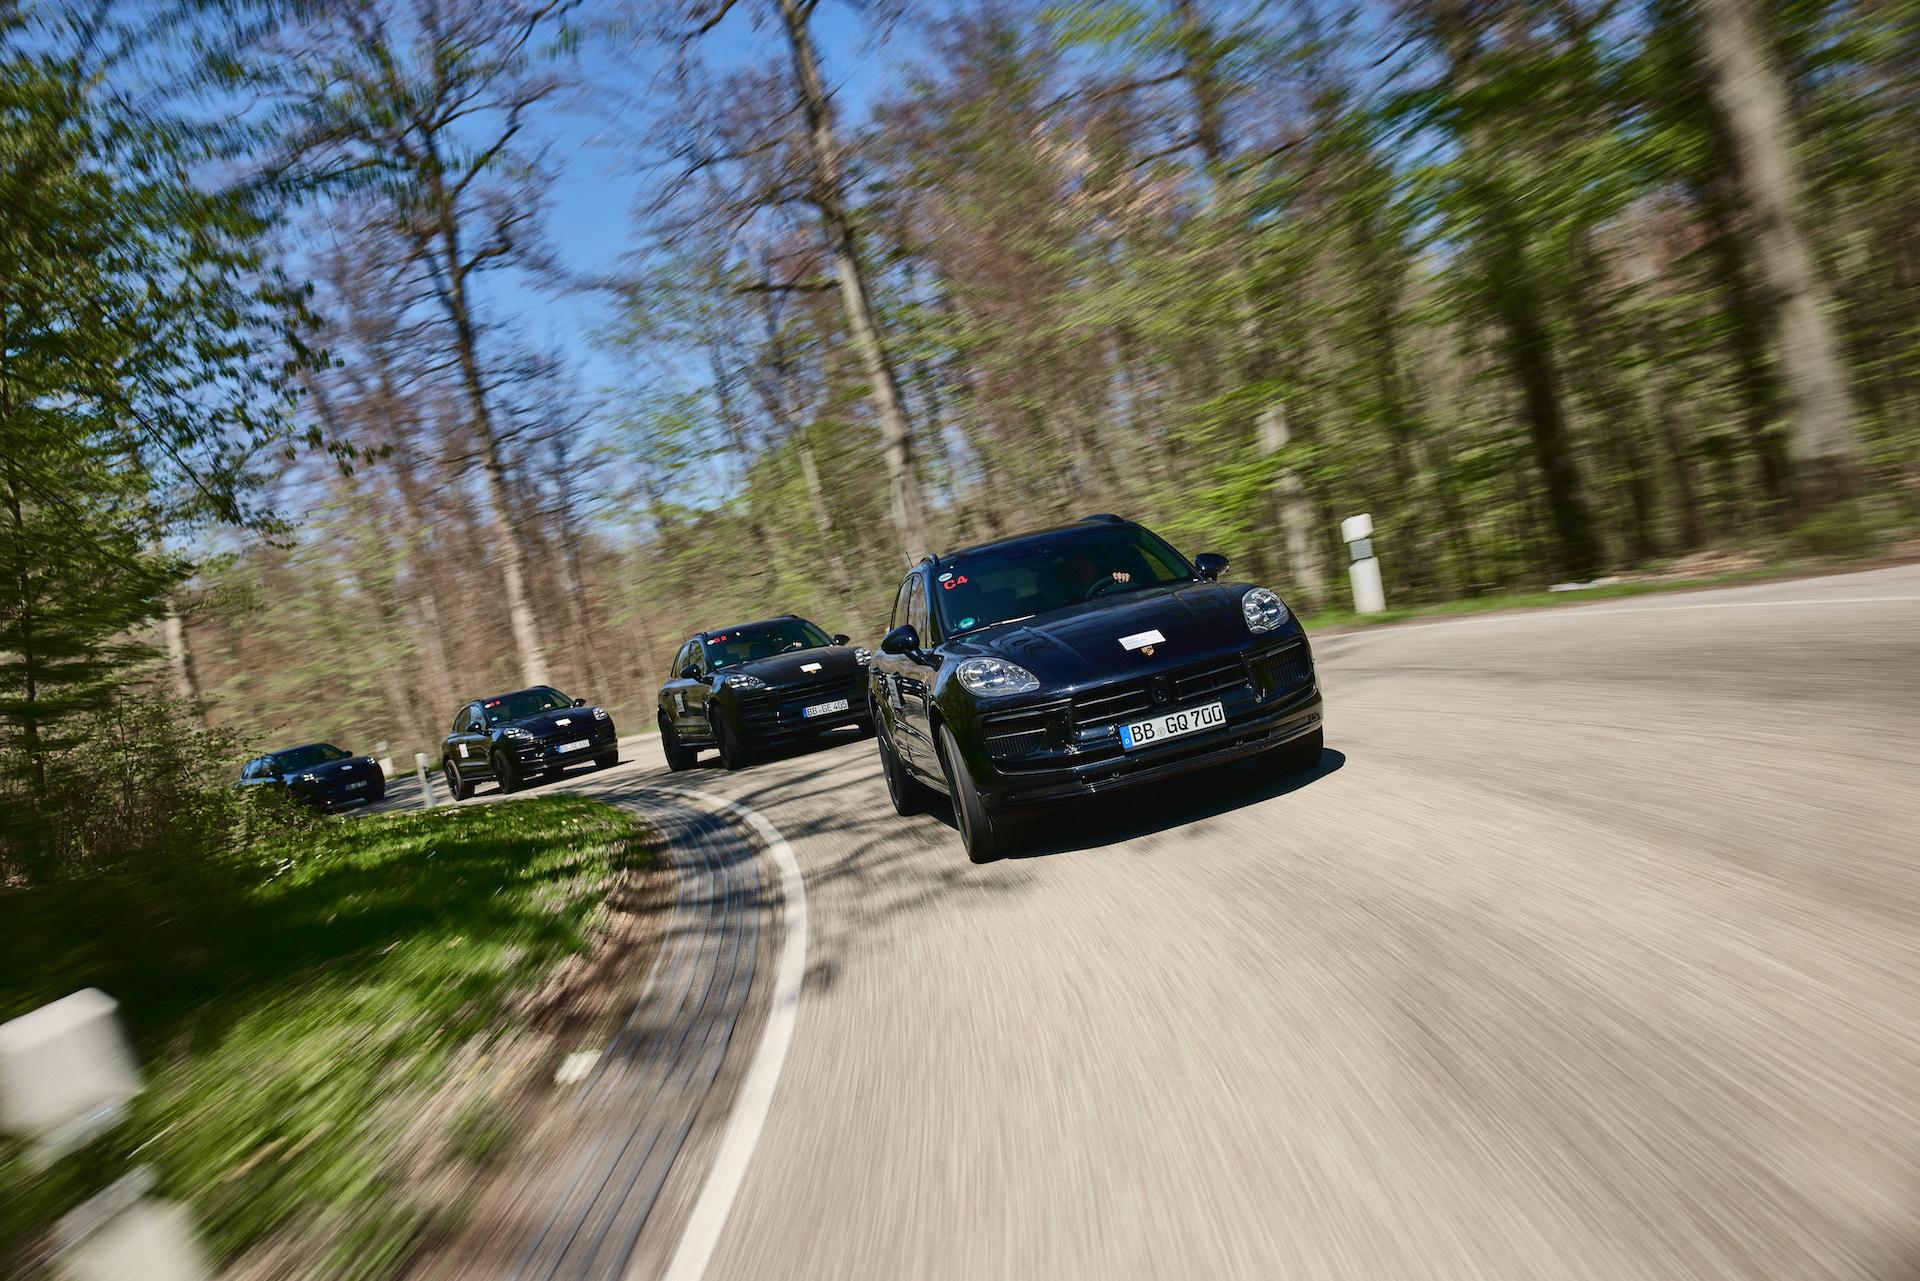 2022 Porsche Macan, R34 Nissan GT-R, 2022 Toyota Tundra: This Week's Top Photos